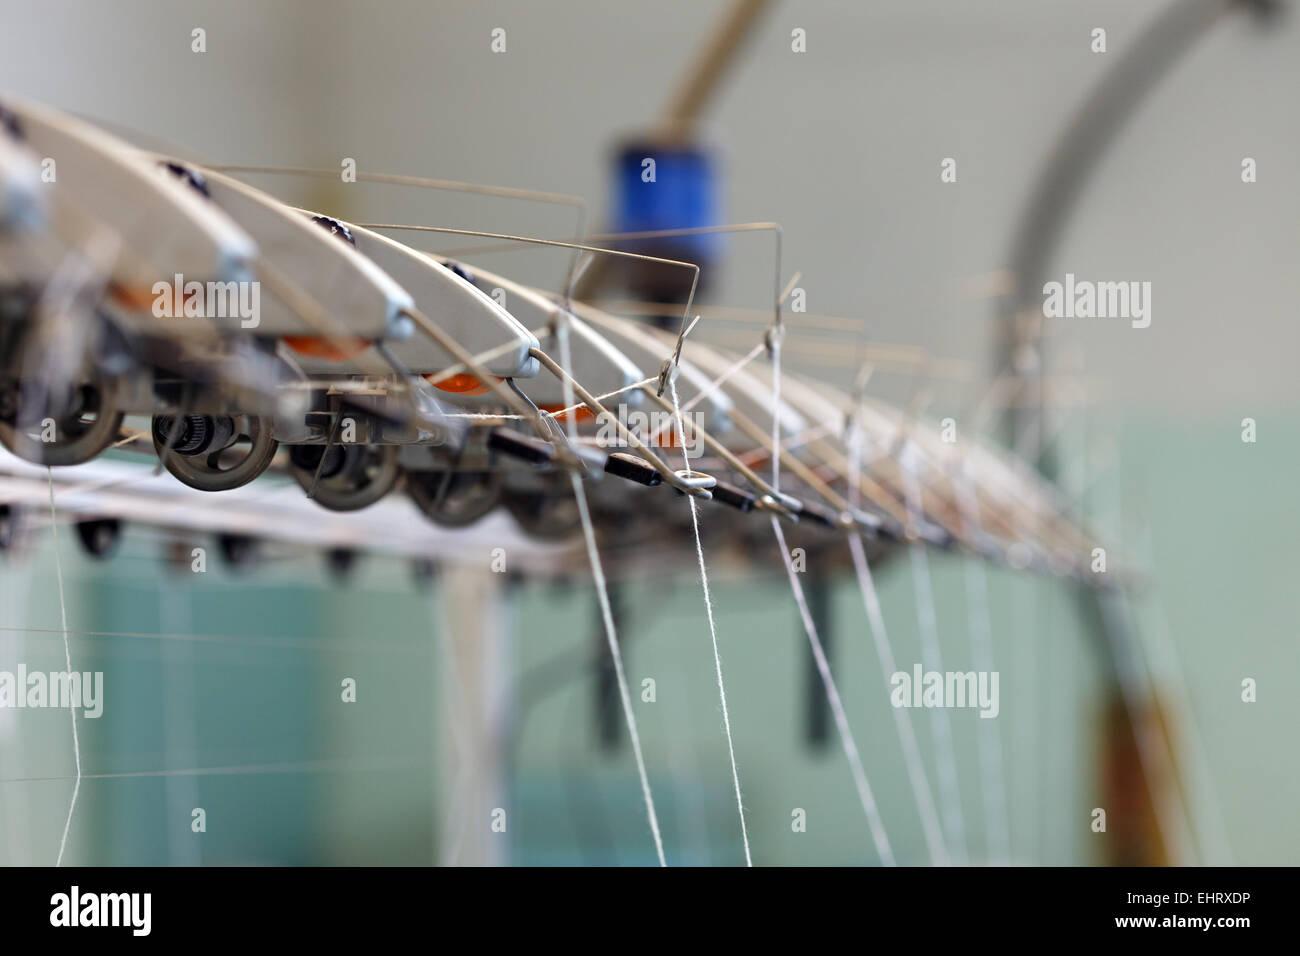 Image thread in holders on loom Stock Photo